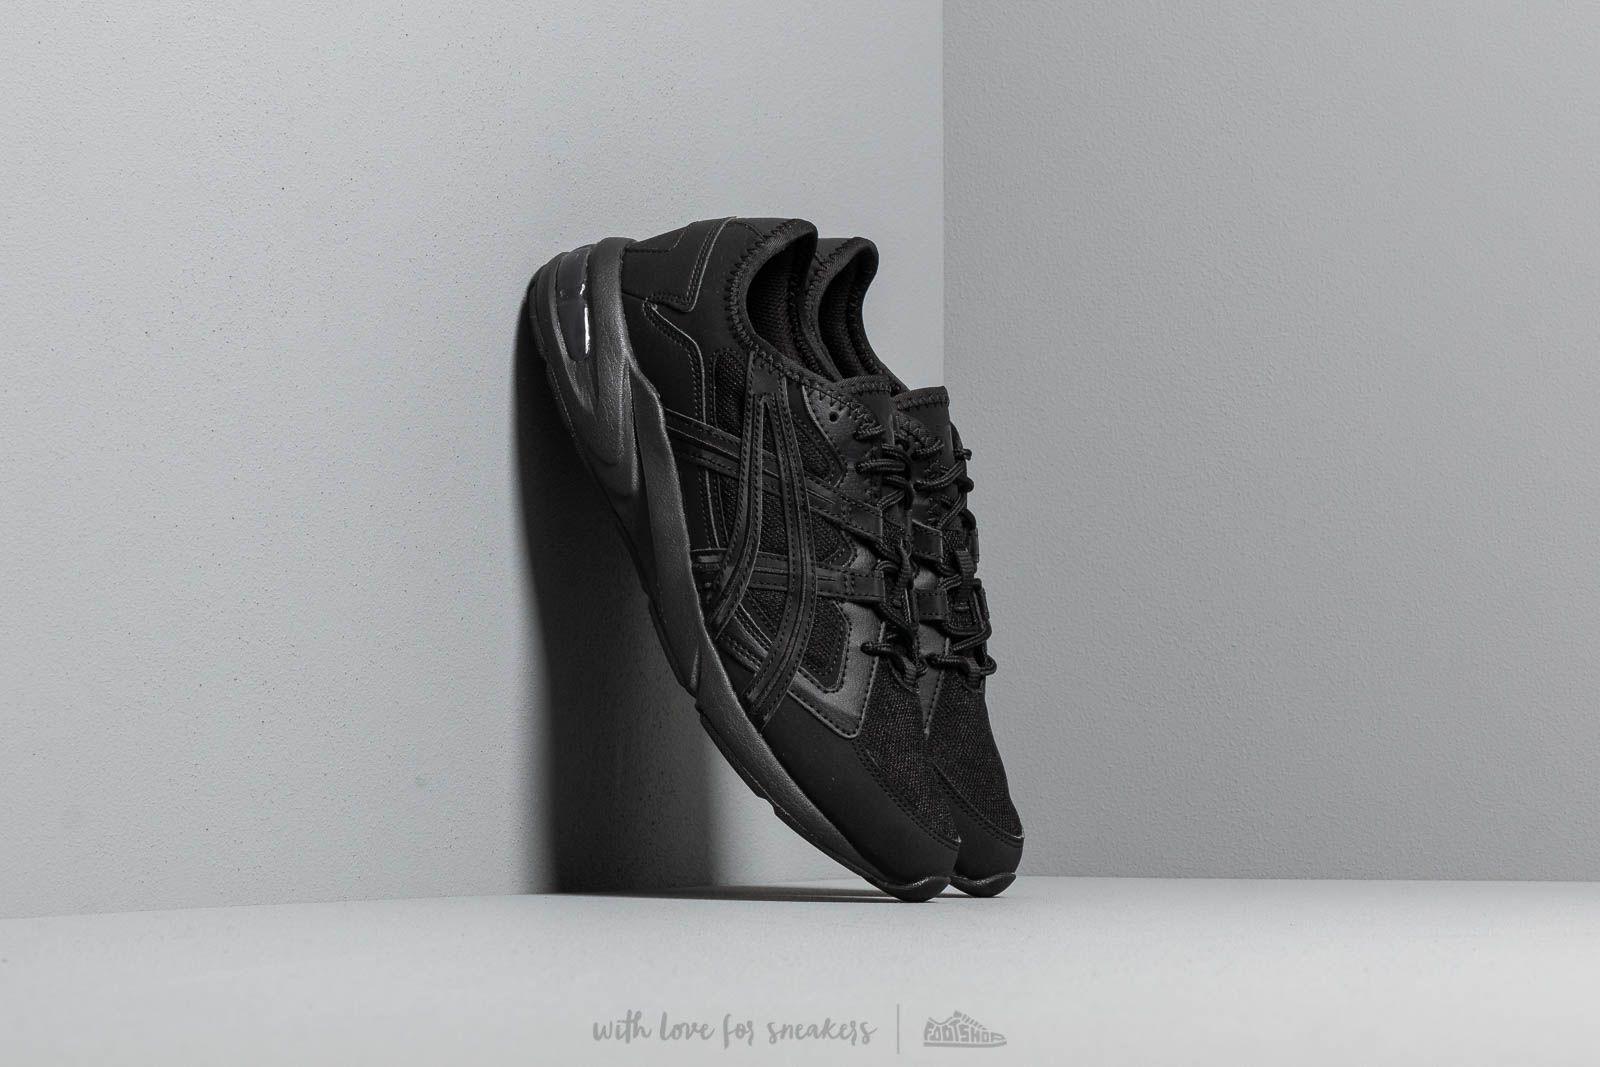 Asics Gel-Kayano 5.1 Black/ Black za skvelú cenu 103 € kúpite na Footshop.sk